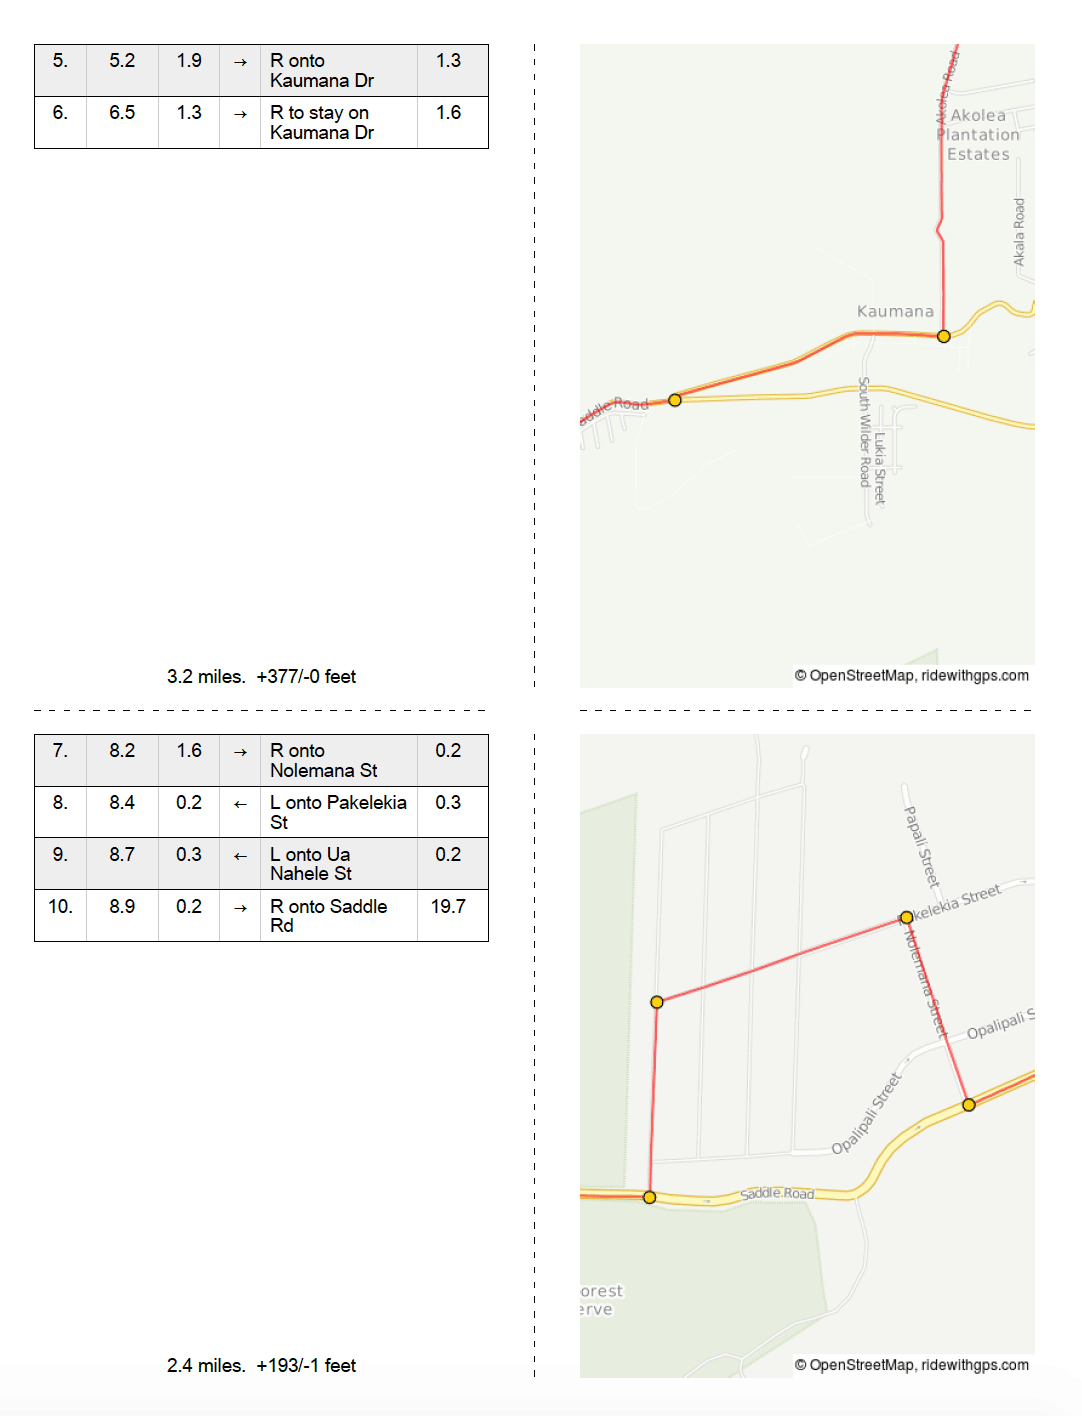 pdf-experimental-map